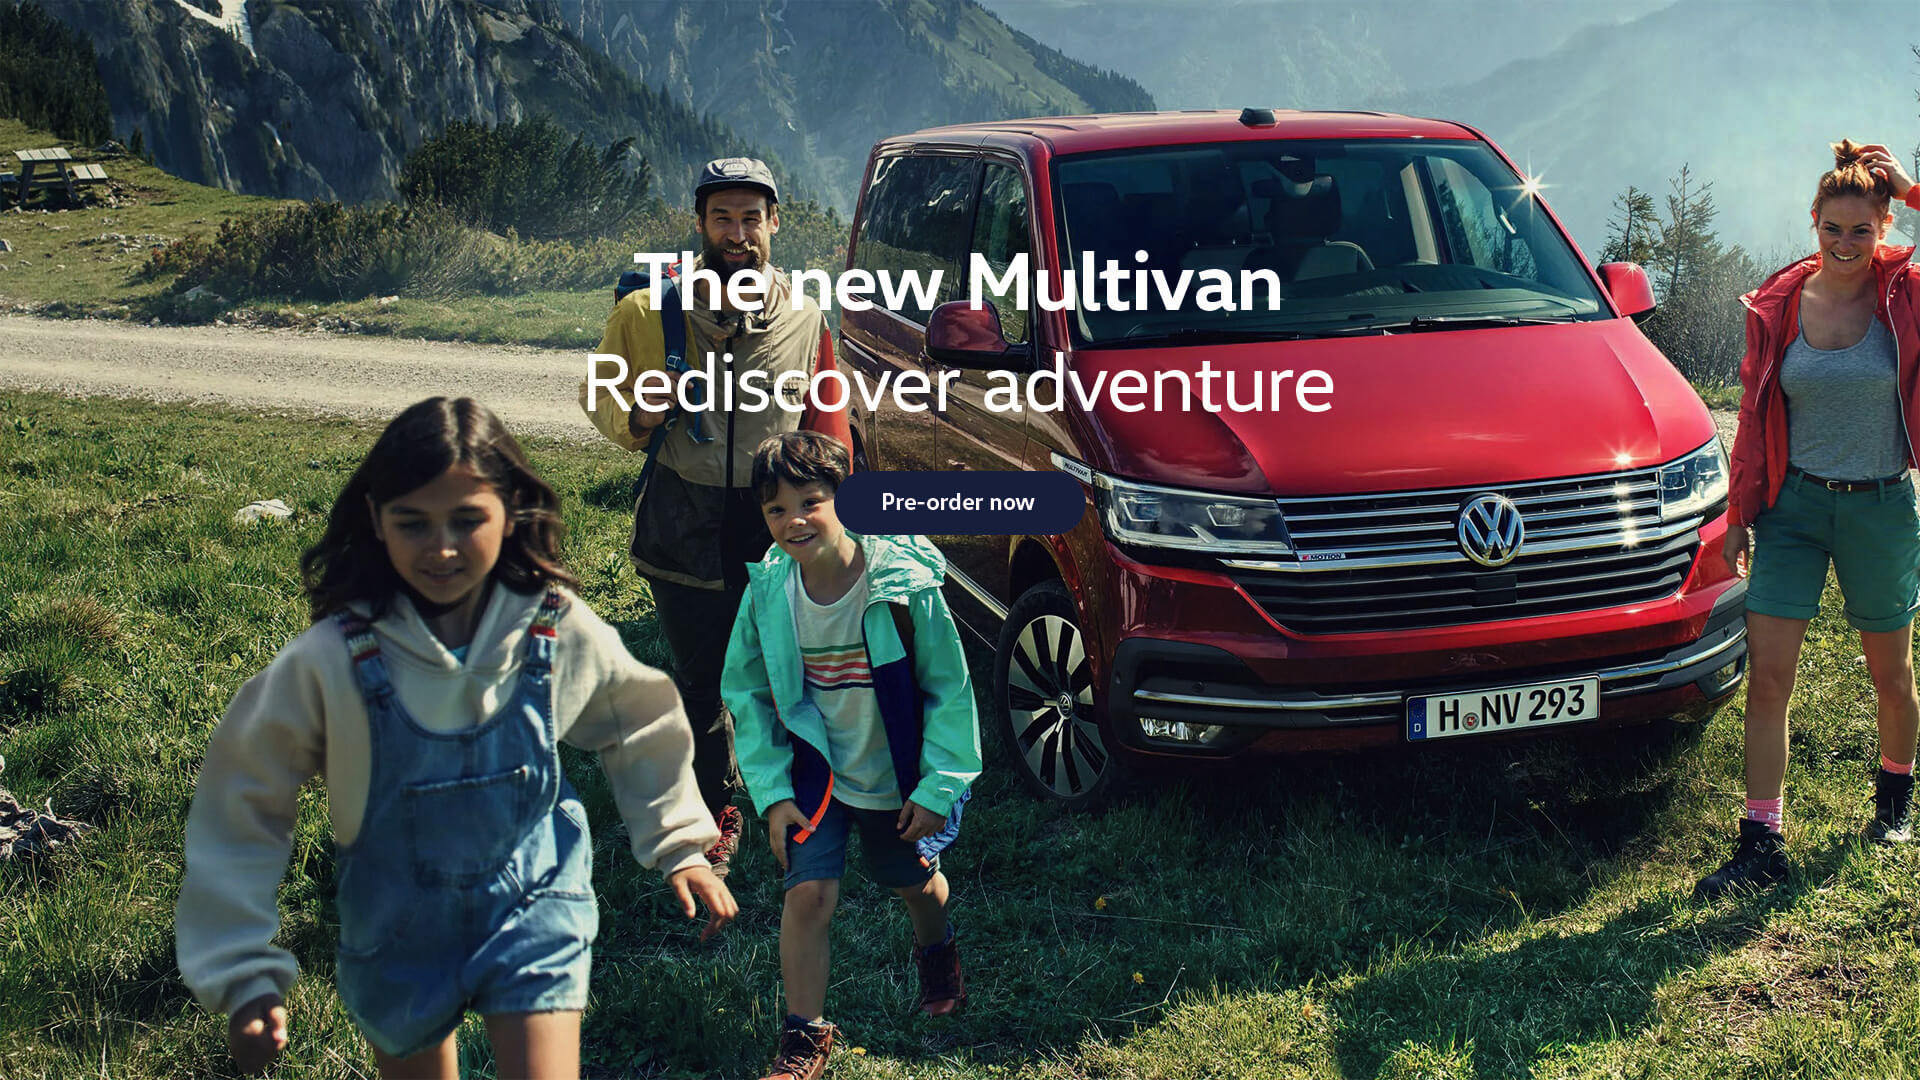 The new Multivan. Rediscover Adventure.